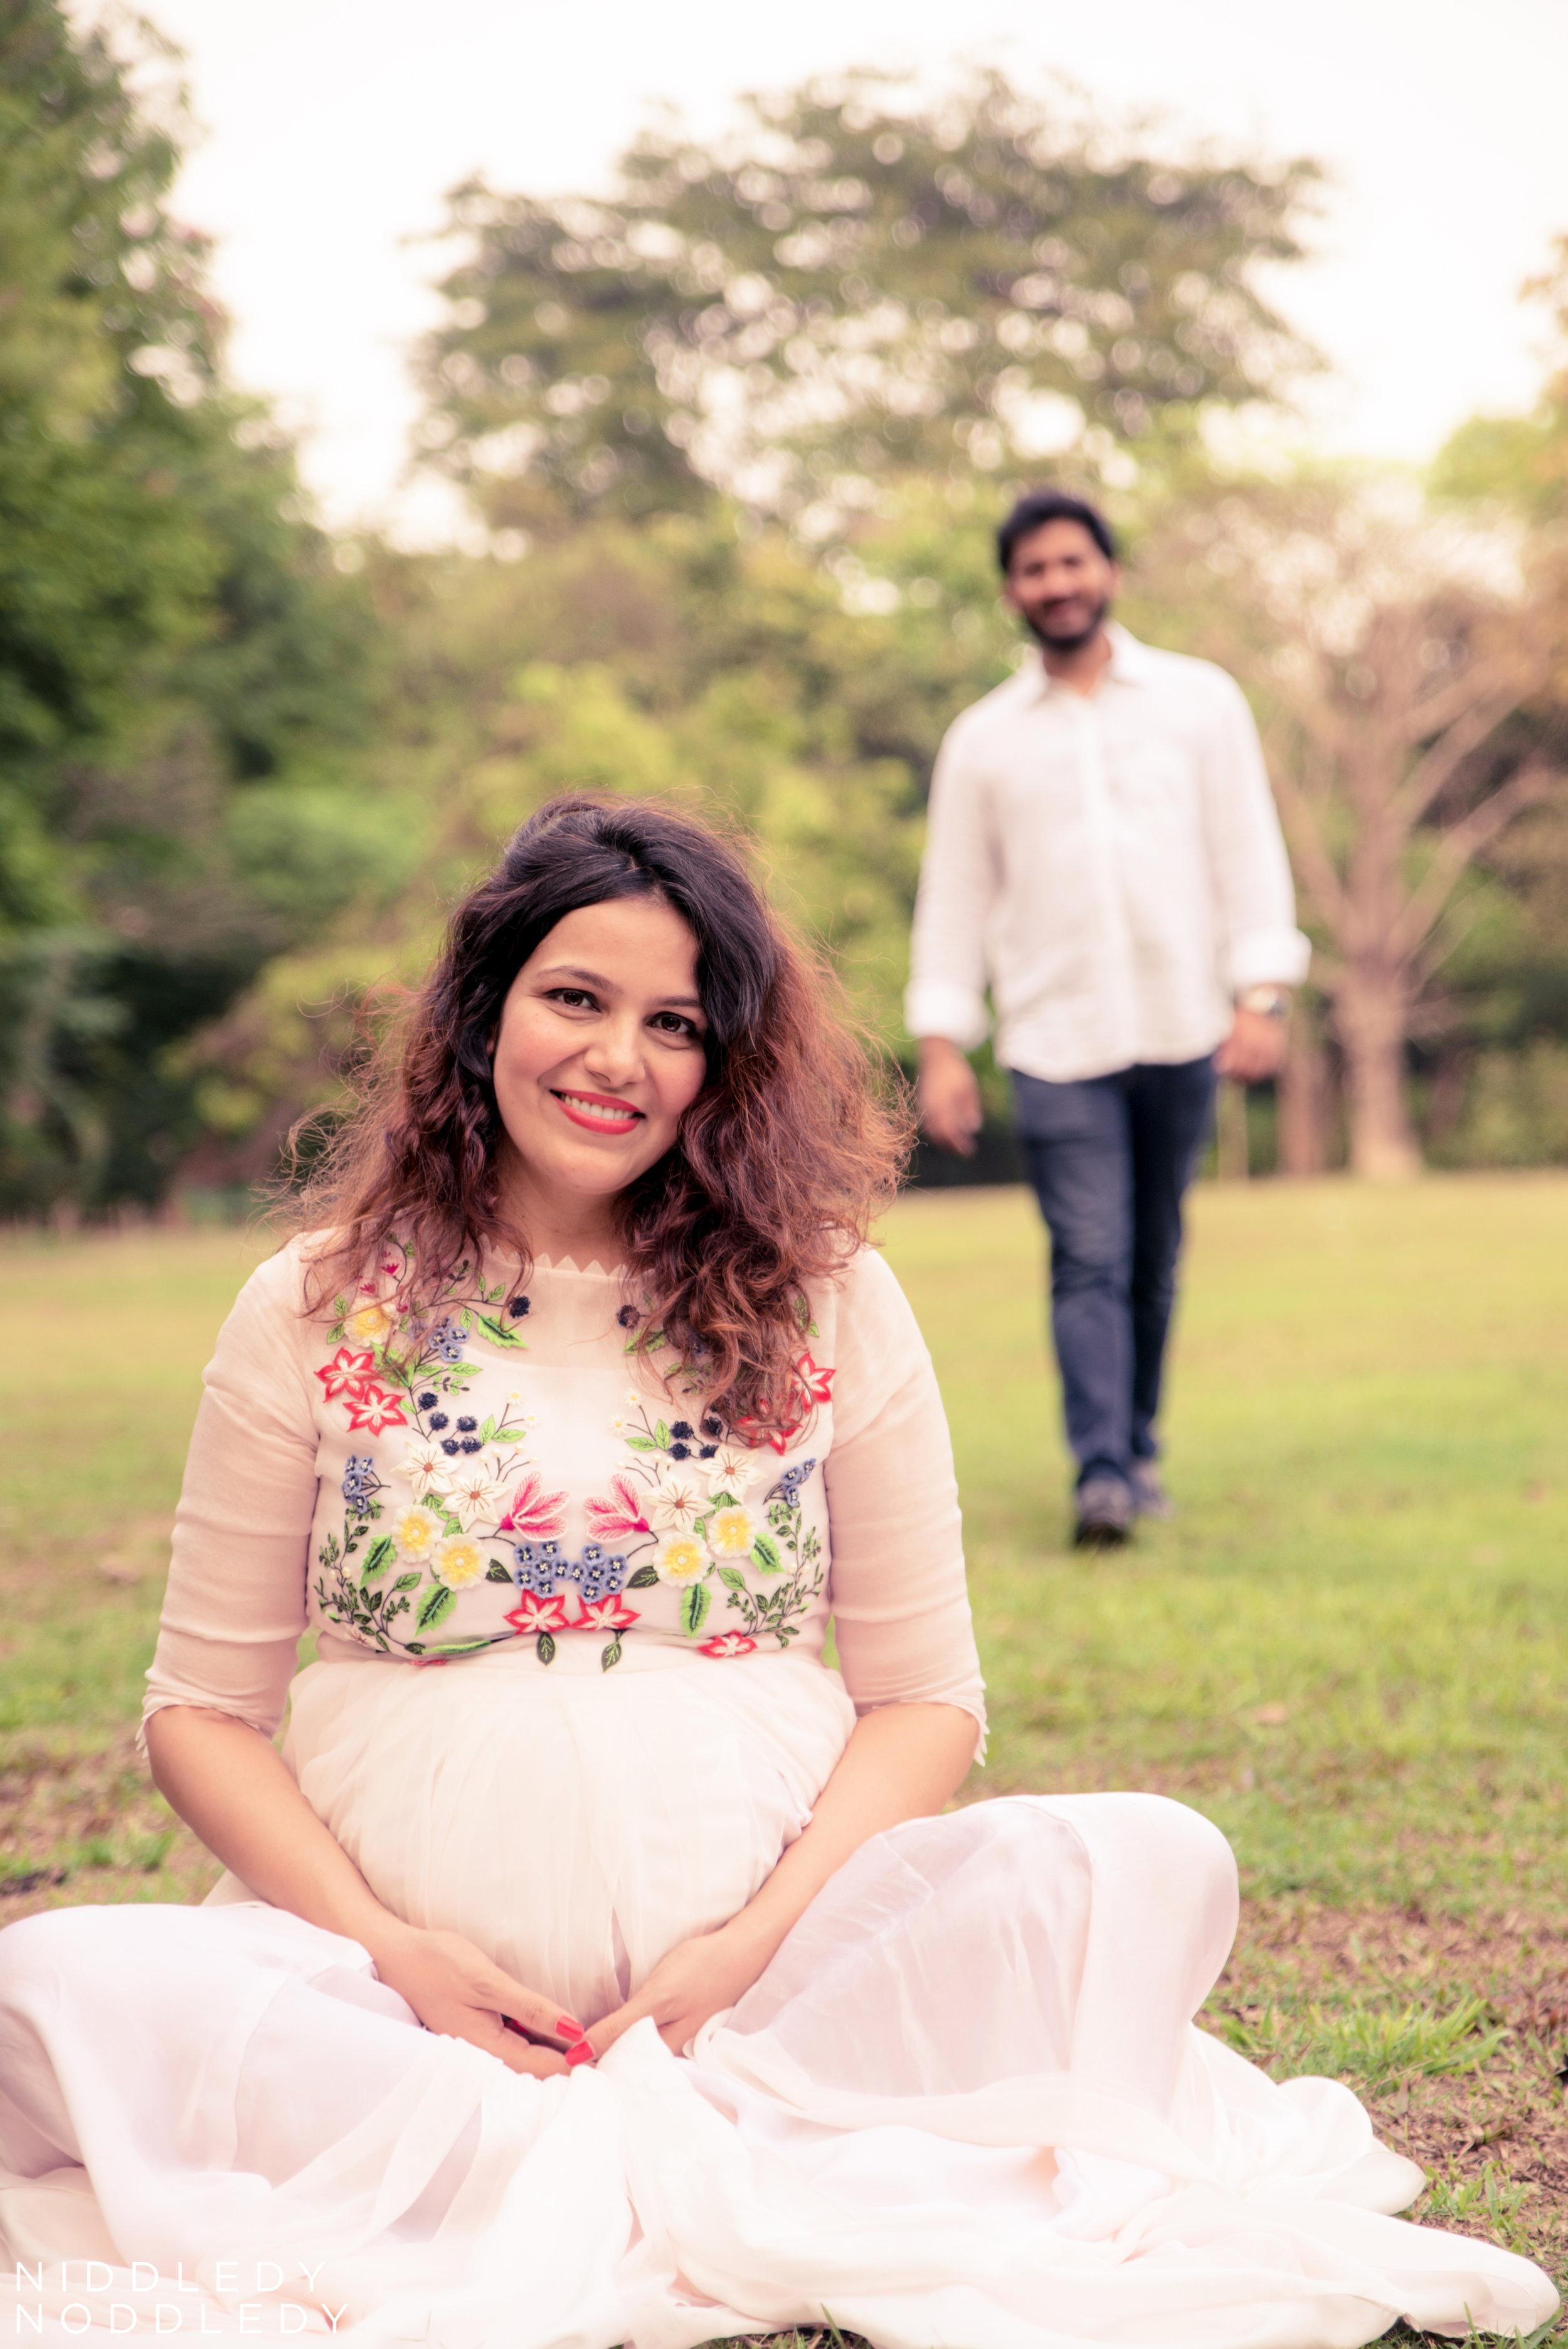 Richa Maternity Photoshoot ❤ NiddledyNoddledy.com ~ Bumps to Babies Photography, Kolkata - 12.jpg